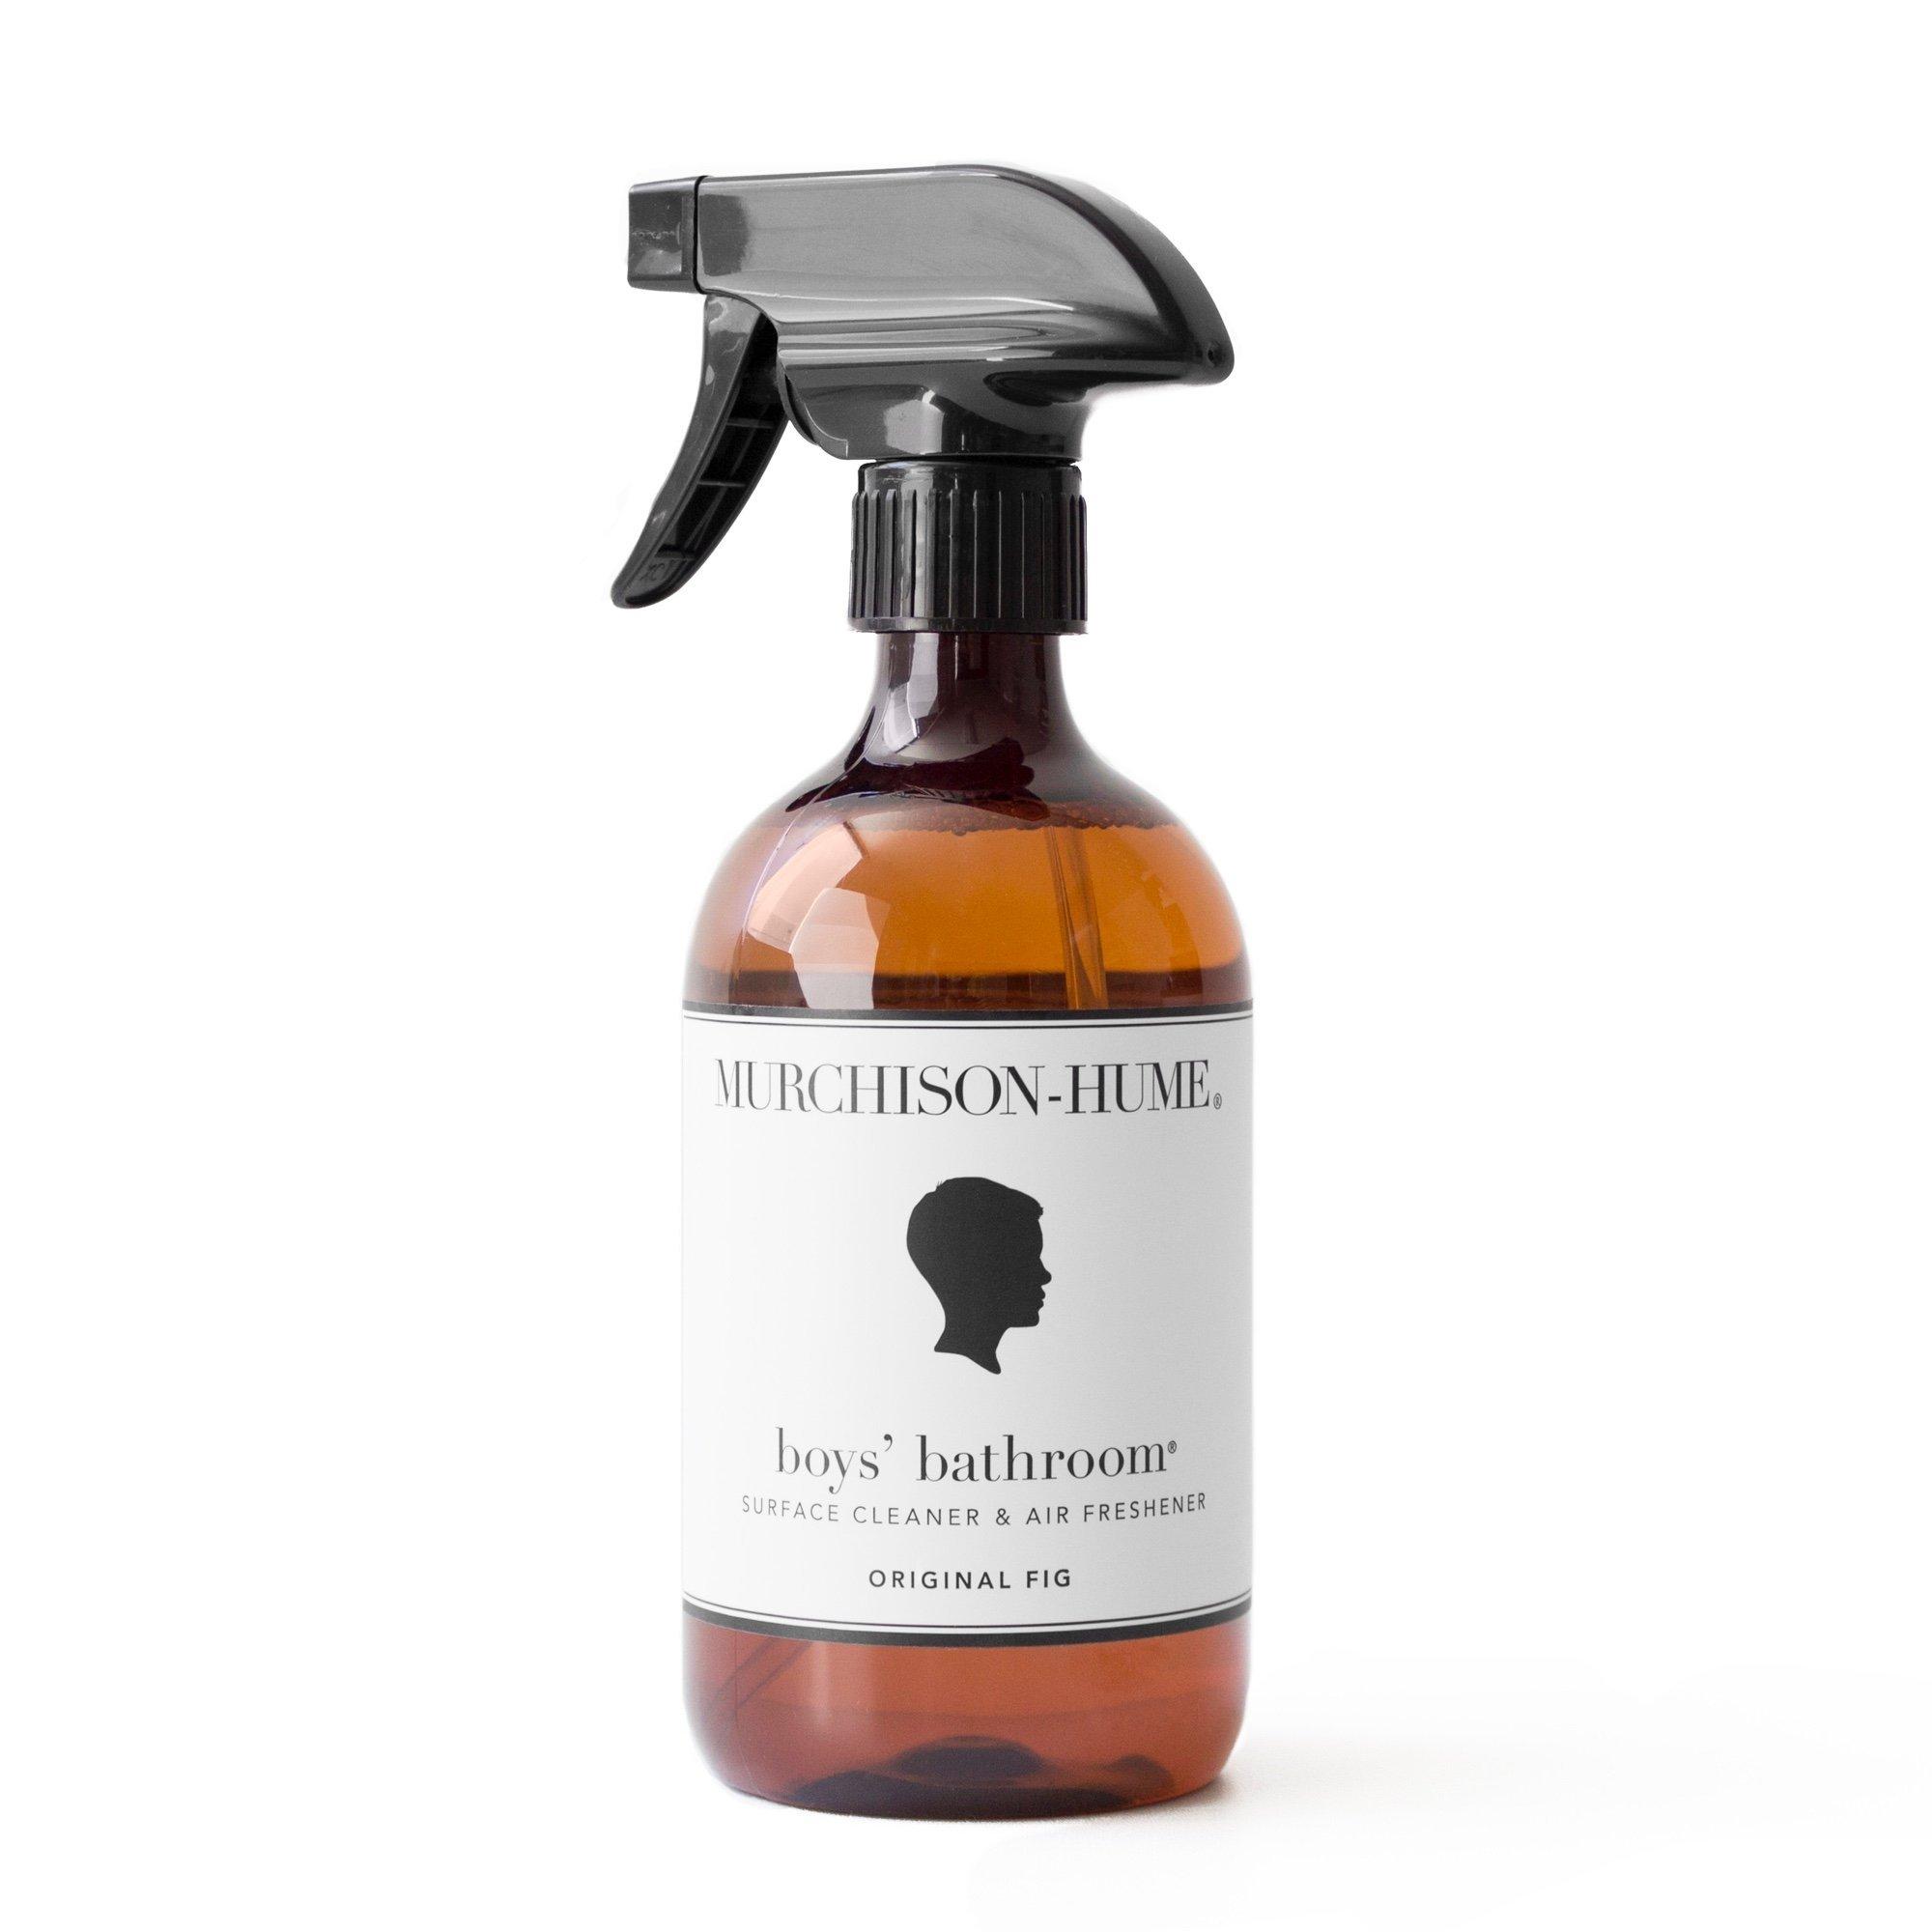 Murchison-Hume Boys Bathroom Cleaner - Original Fig - 17 Oz